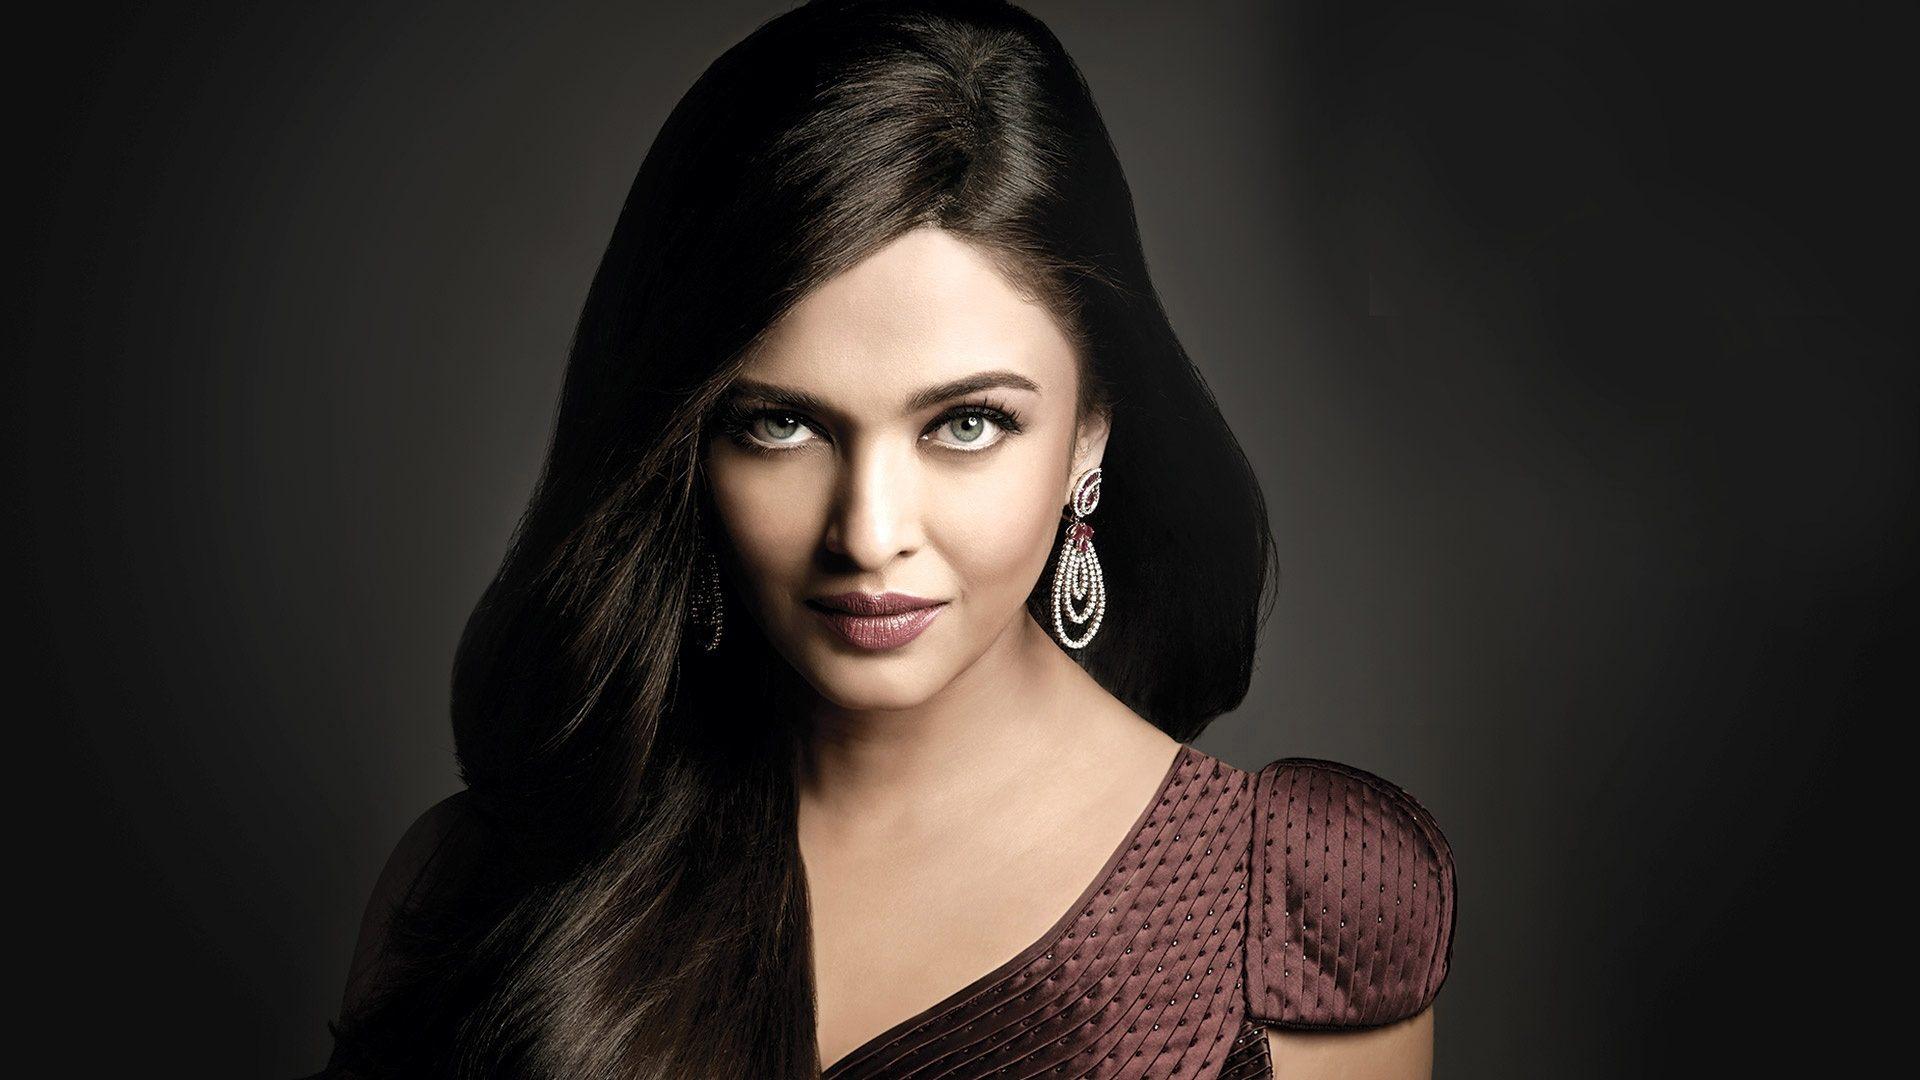 Indian Actresses images Aishwarya Rai HD wallpaper and background photos